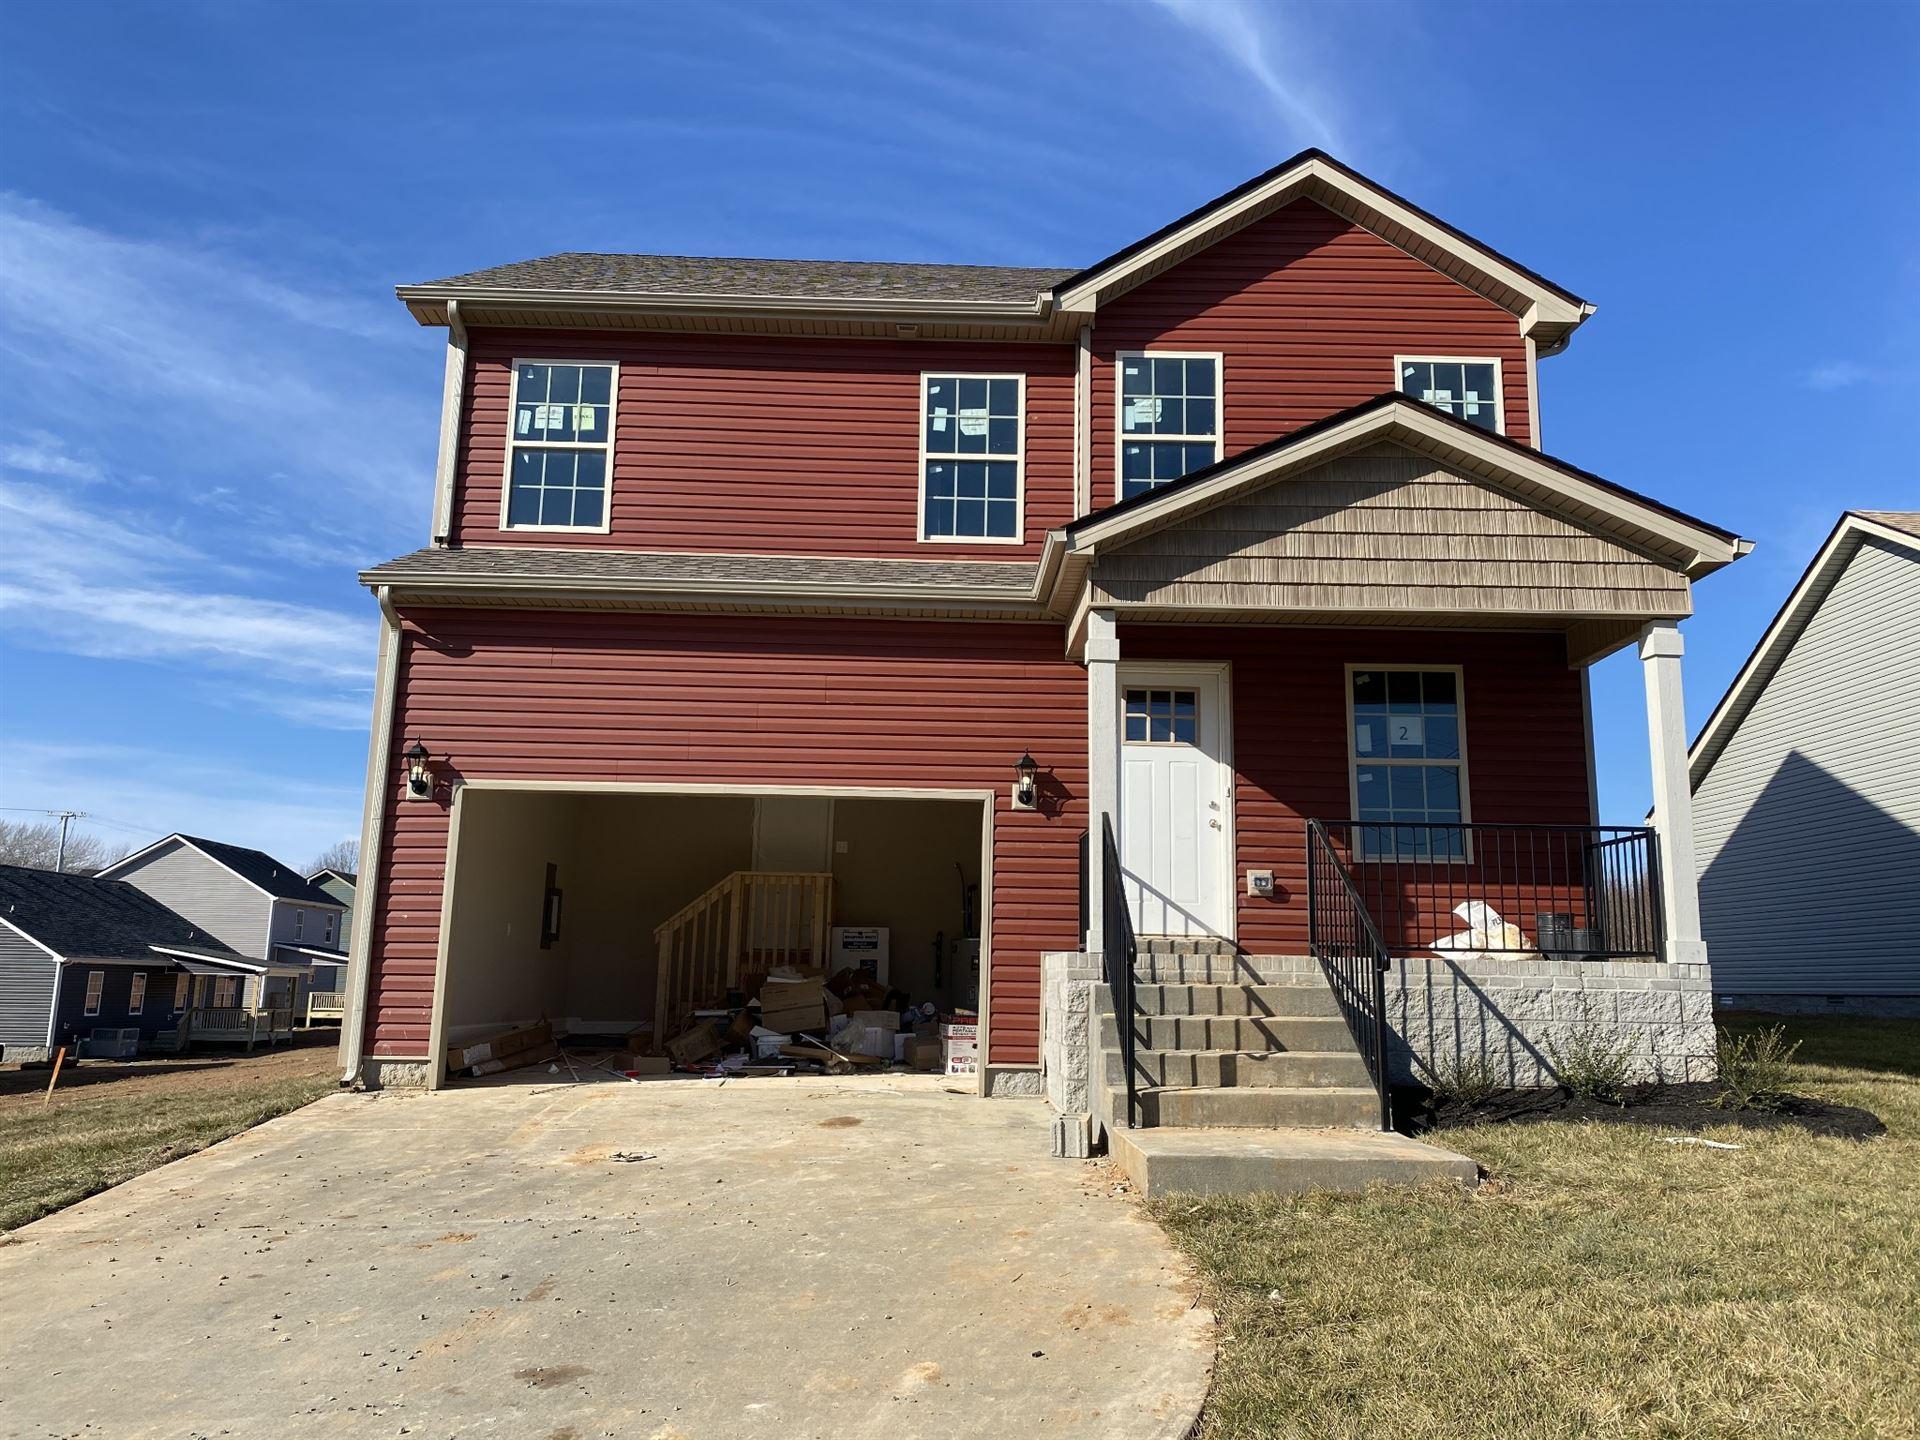 1902 Old Trenton Rd. Lot 2, Clarksville, TN 37042 - MLS#: 2205348